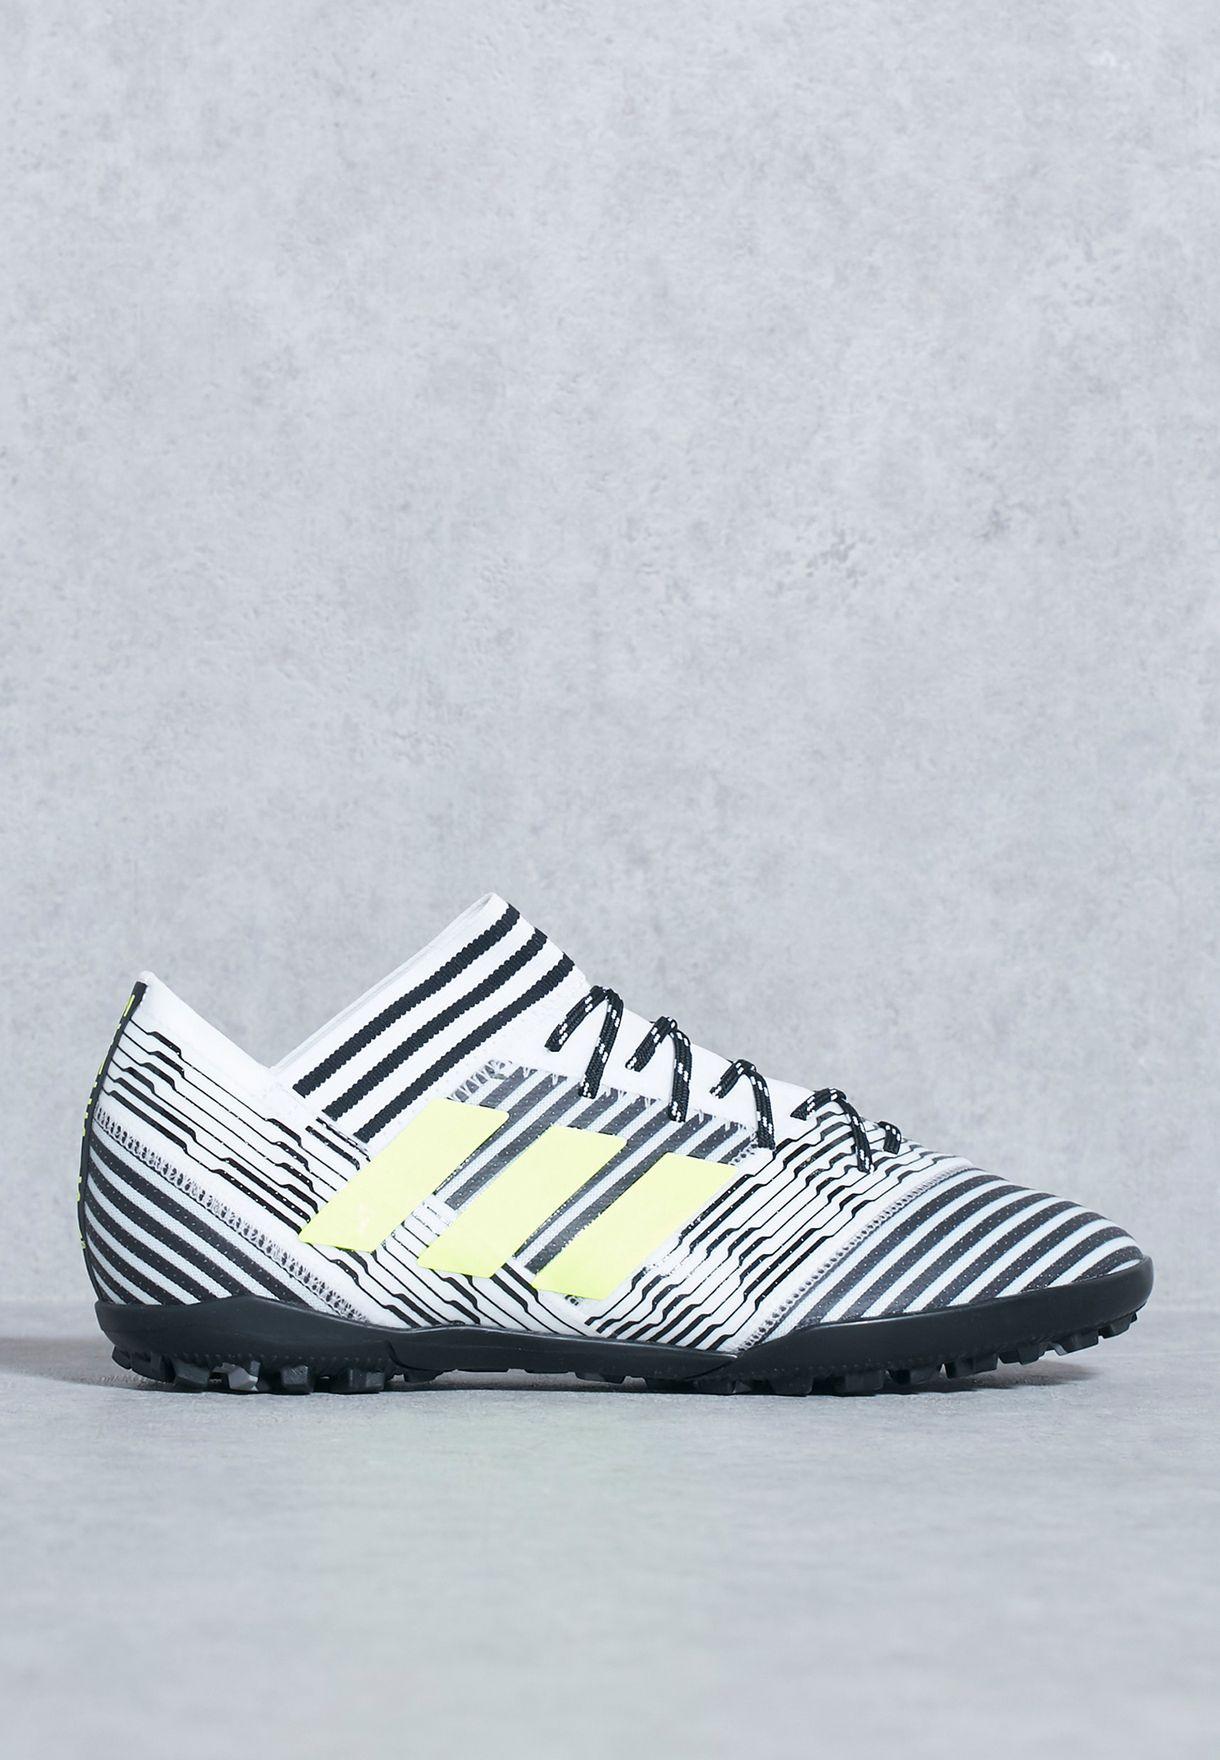 51c296c65 Shop adidas monochrome Nemeziz Tango 17.3 TF BB3657 for Men in ...